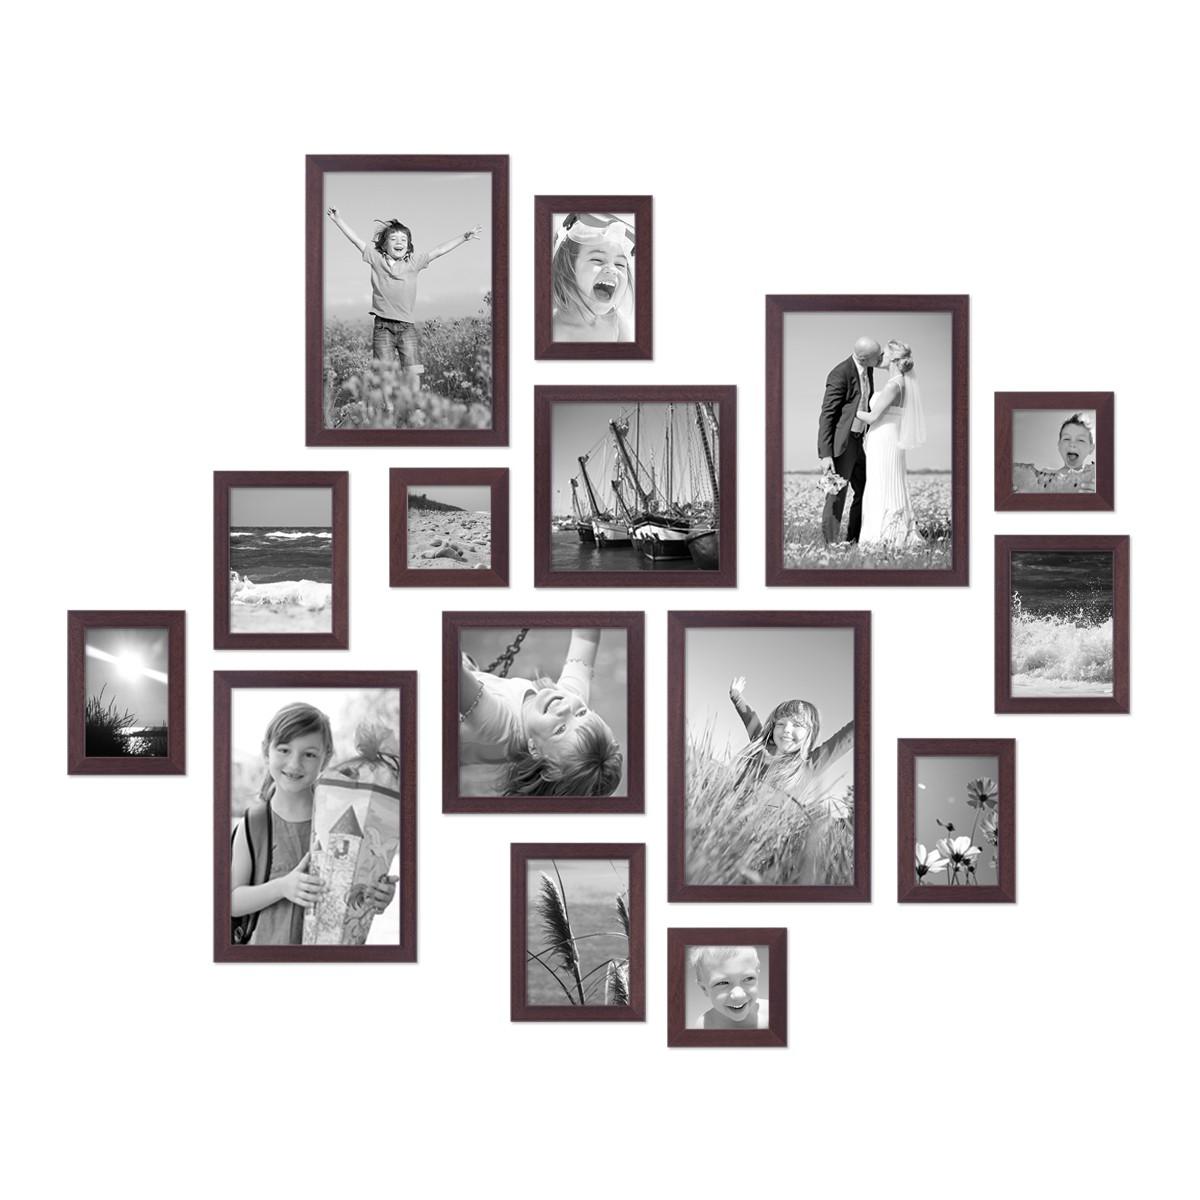 15er set bilderrahmen modern nuss massivholz 10x15 bis 20x30 cm inklusive zubeh r zur gestaltung. Black Bedroom Furniture Sets. Home Design Ideas